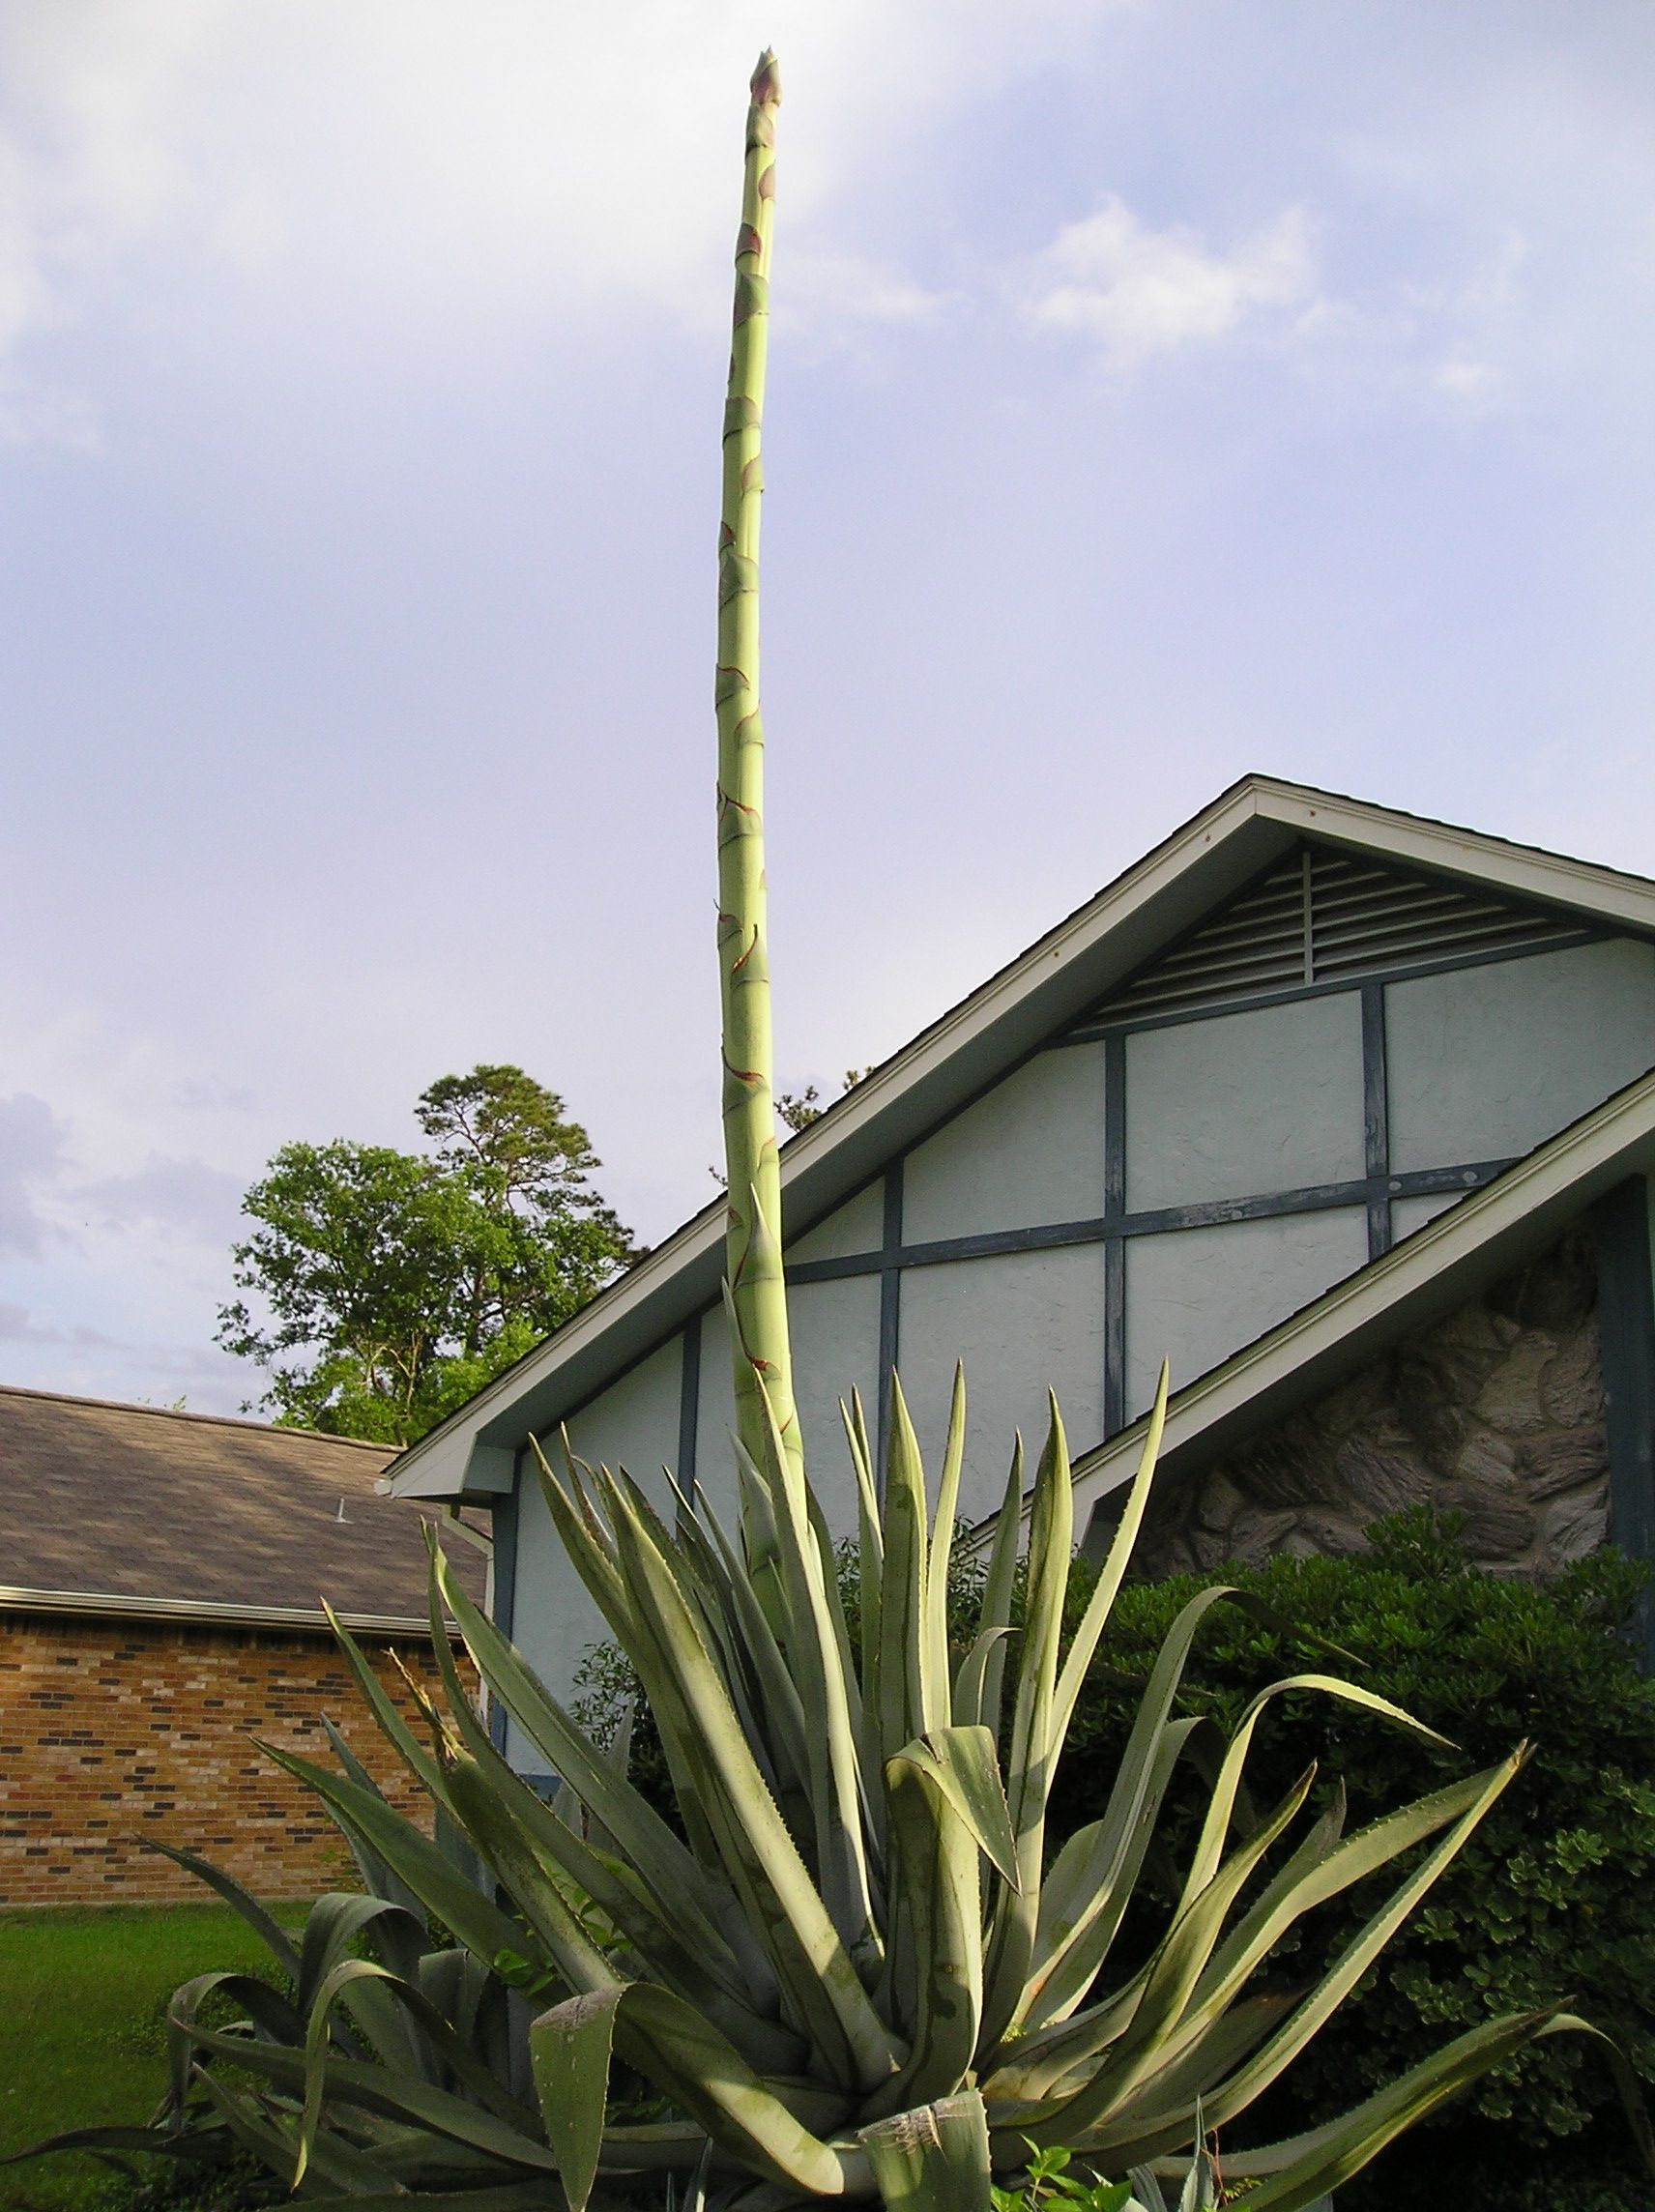 I Think The Desert Plants Look Like A Giant Asparagus Desert Plants Plants Landscape